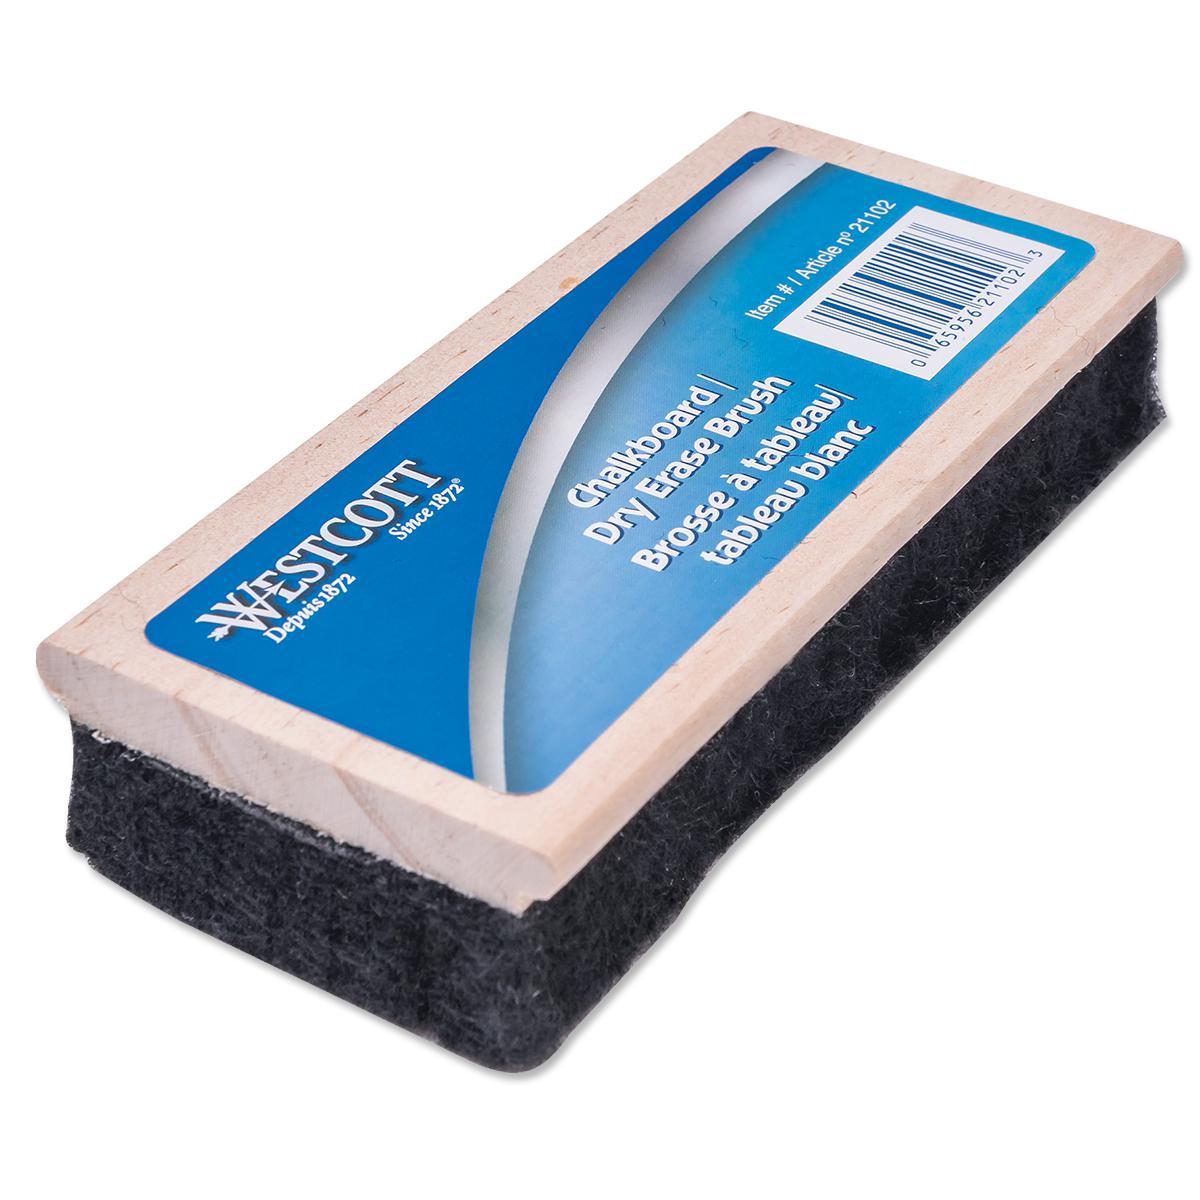 Chalkboard/Dry Erase Brush